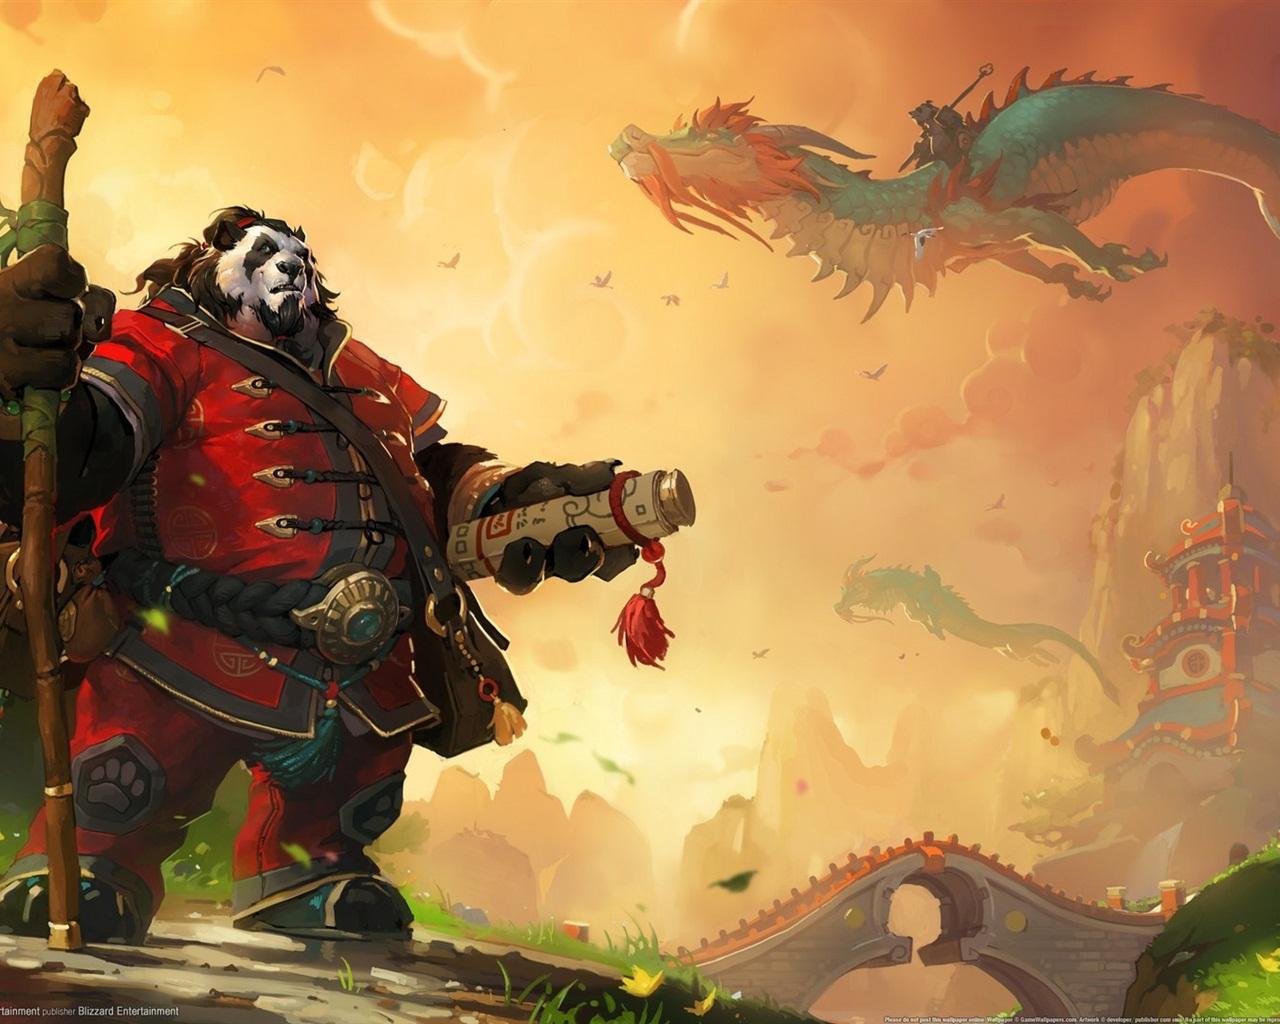 world of warcraft wallpaper 1280x1024 - photo #9